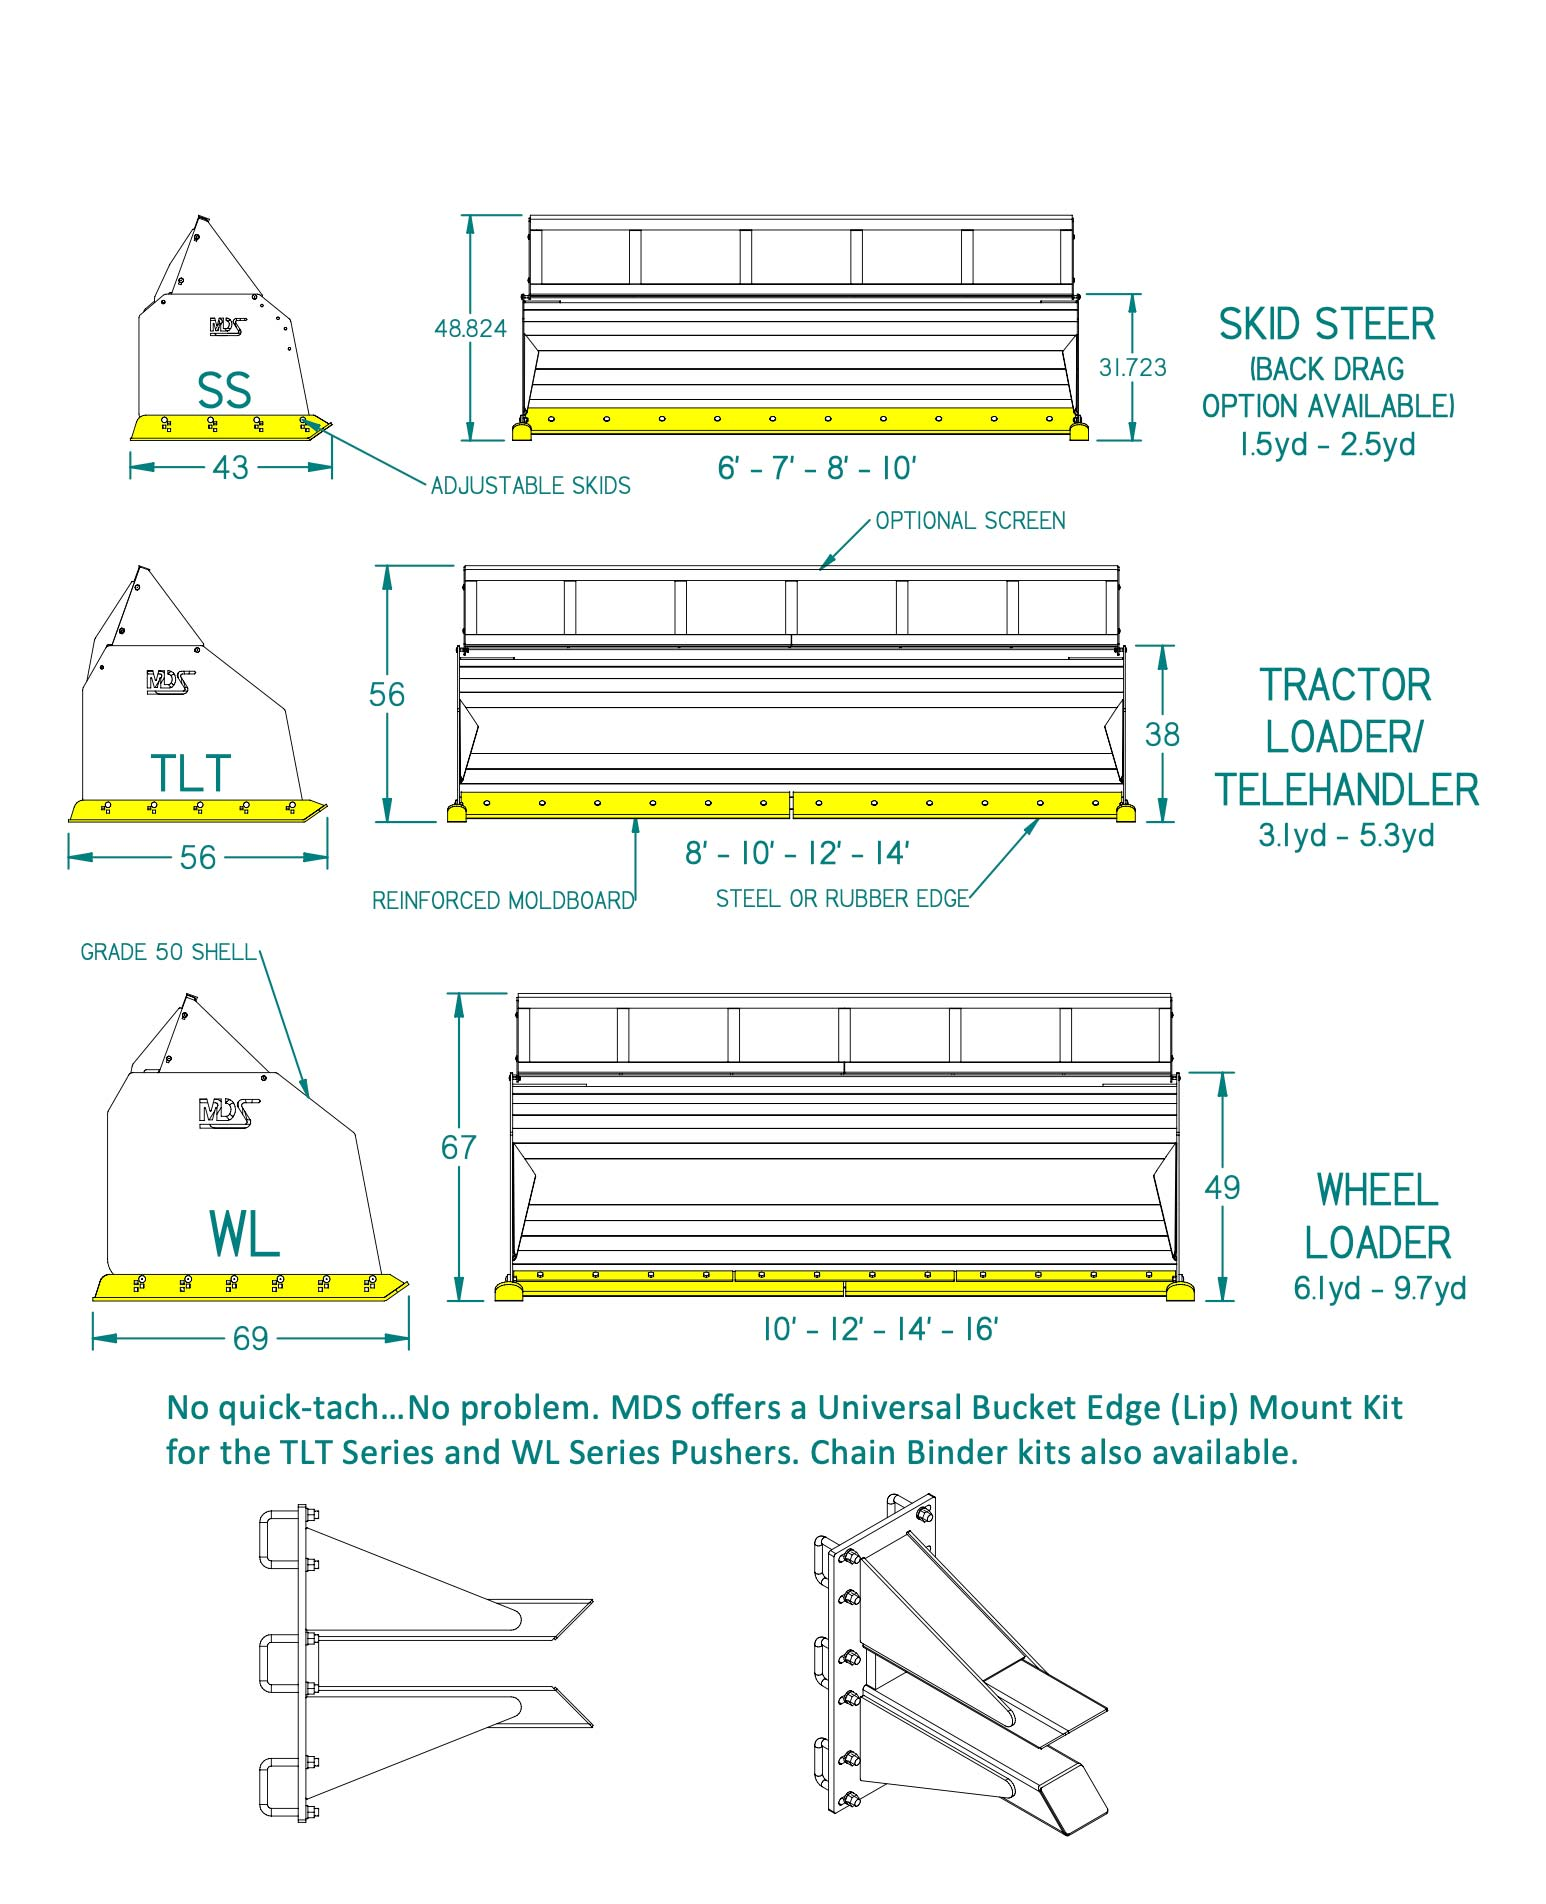 Pusher spec sheet